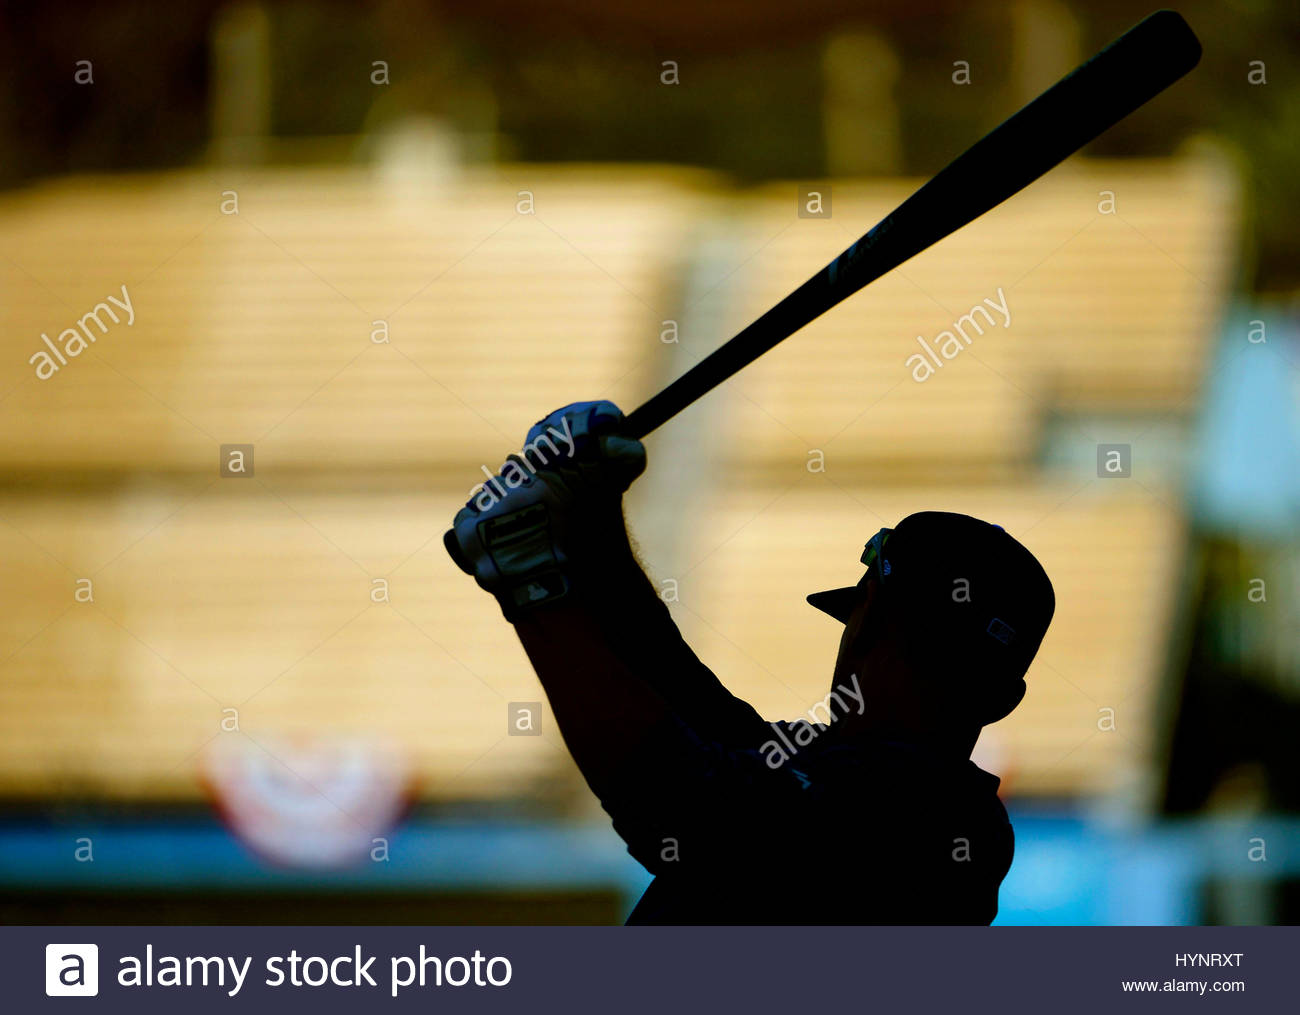 Los Angeles, California, USA. 5th Apr, 2017. Los Angeles Dodgers' Austin Barnes during batting practice prior - Stock Image